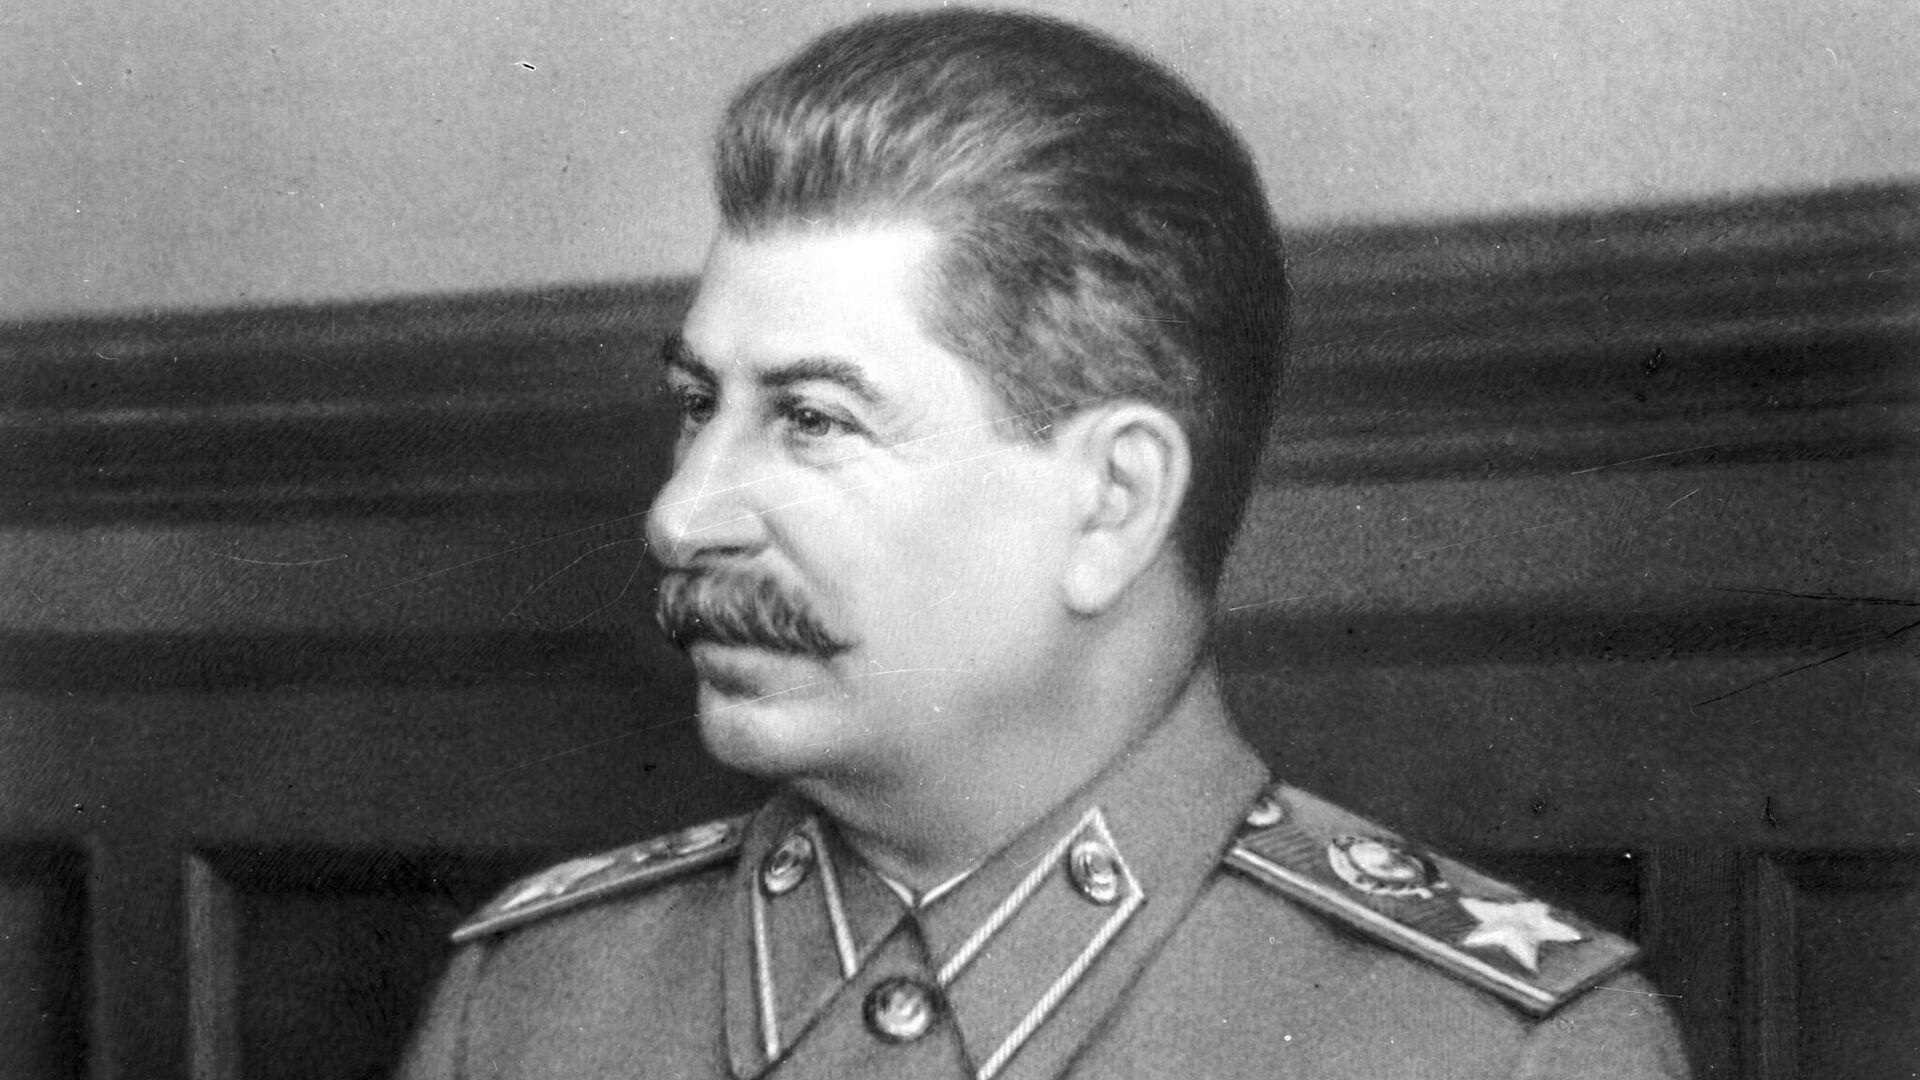 Генералиссимус Советского Союза Иосиф Виссарионович Сталин - РИА Новости, 1920, 24.04.2021